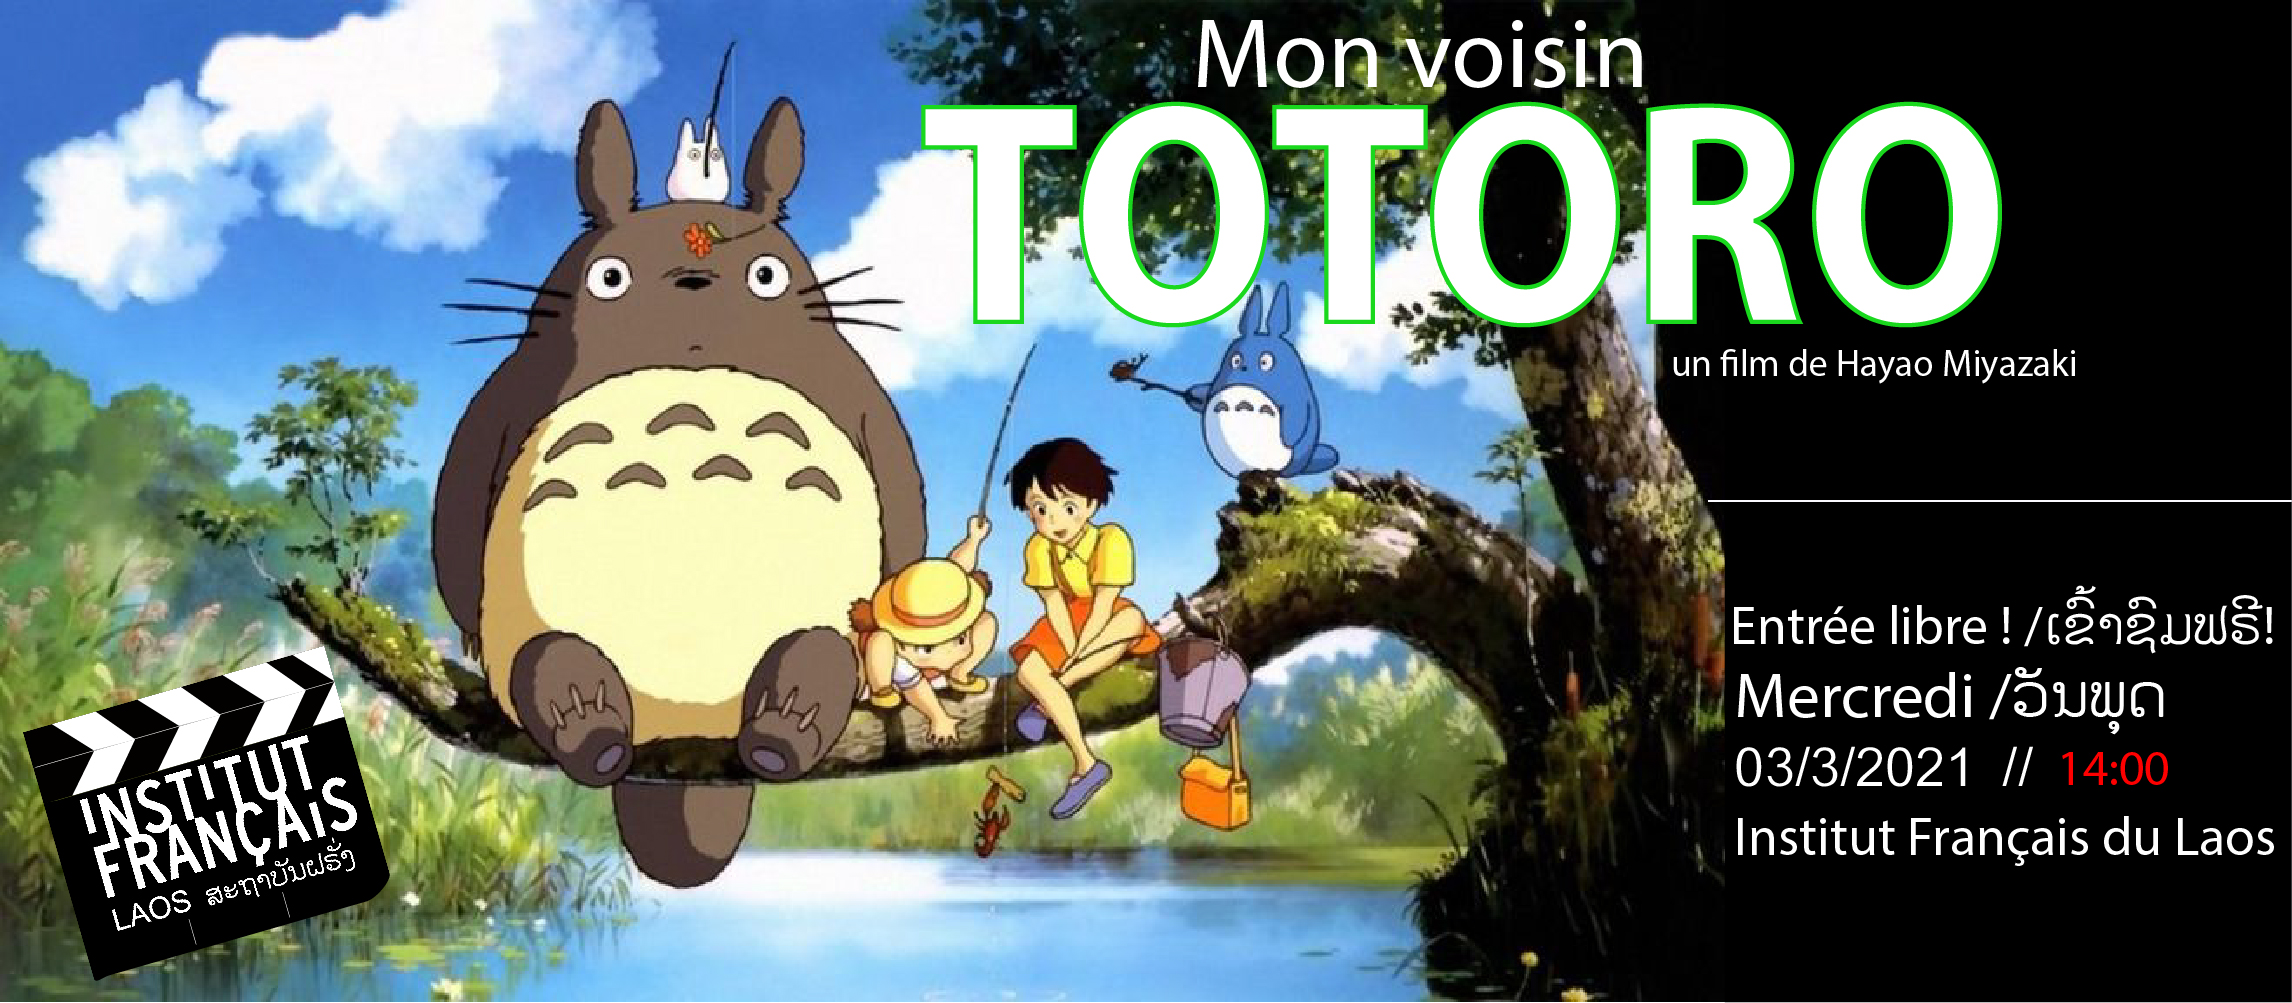 FILM ENFANTS // MON VOISIN TOTORO